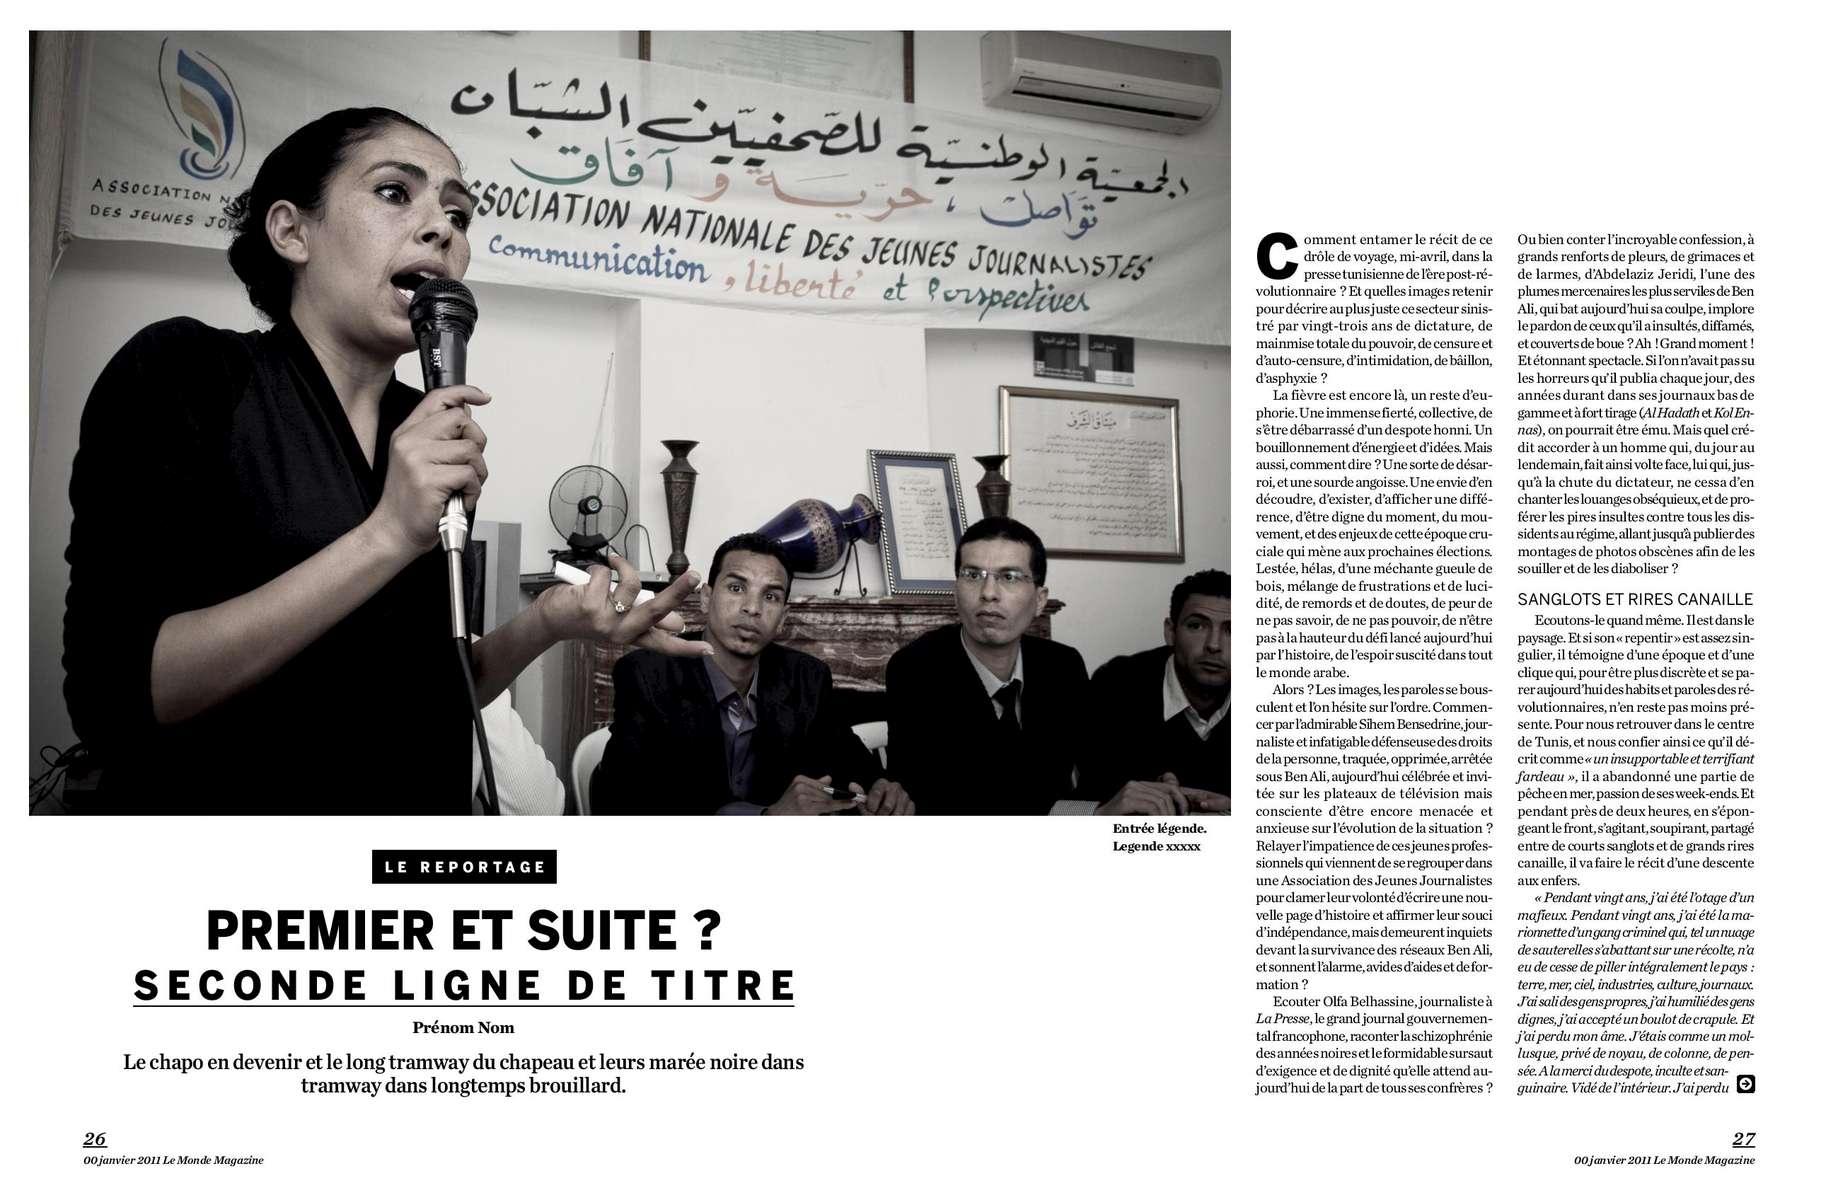 088-REPORT-Tunisie-presse-page-001